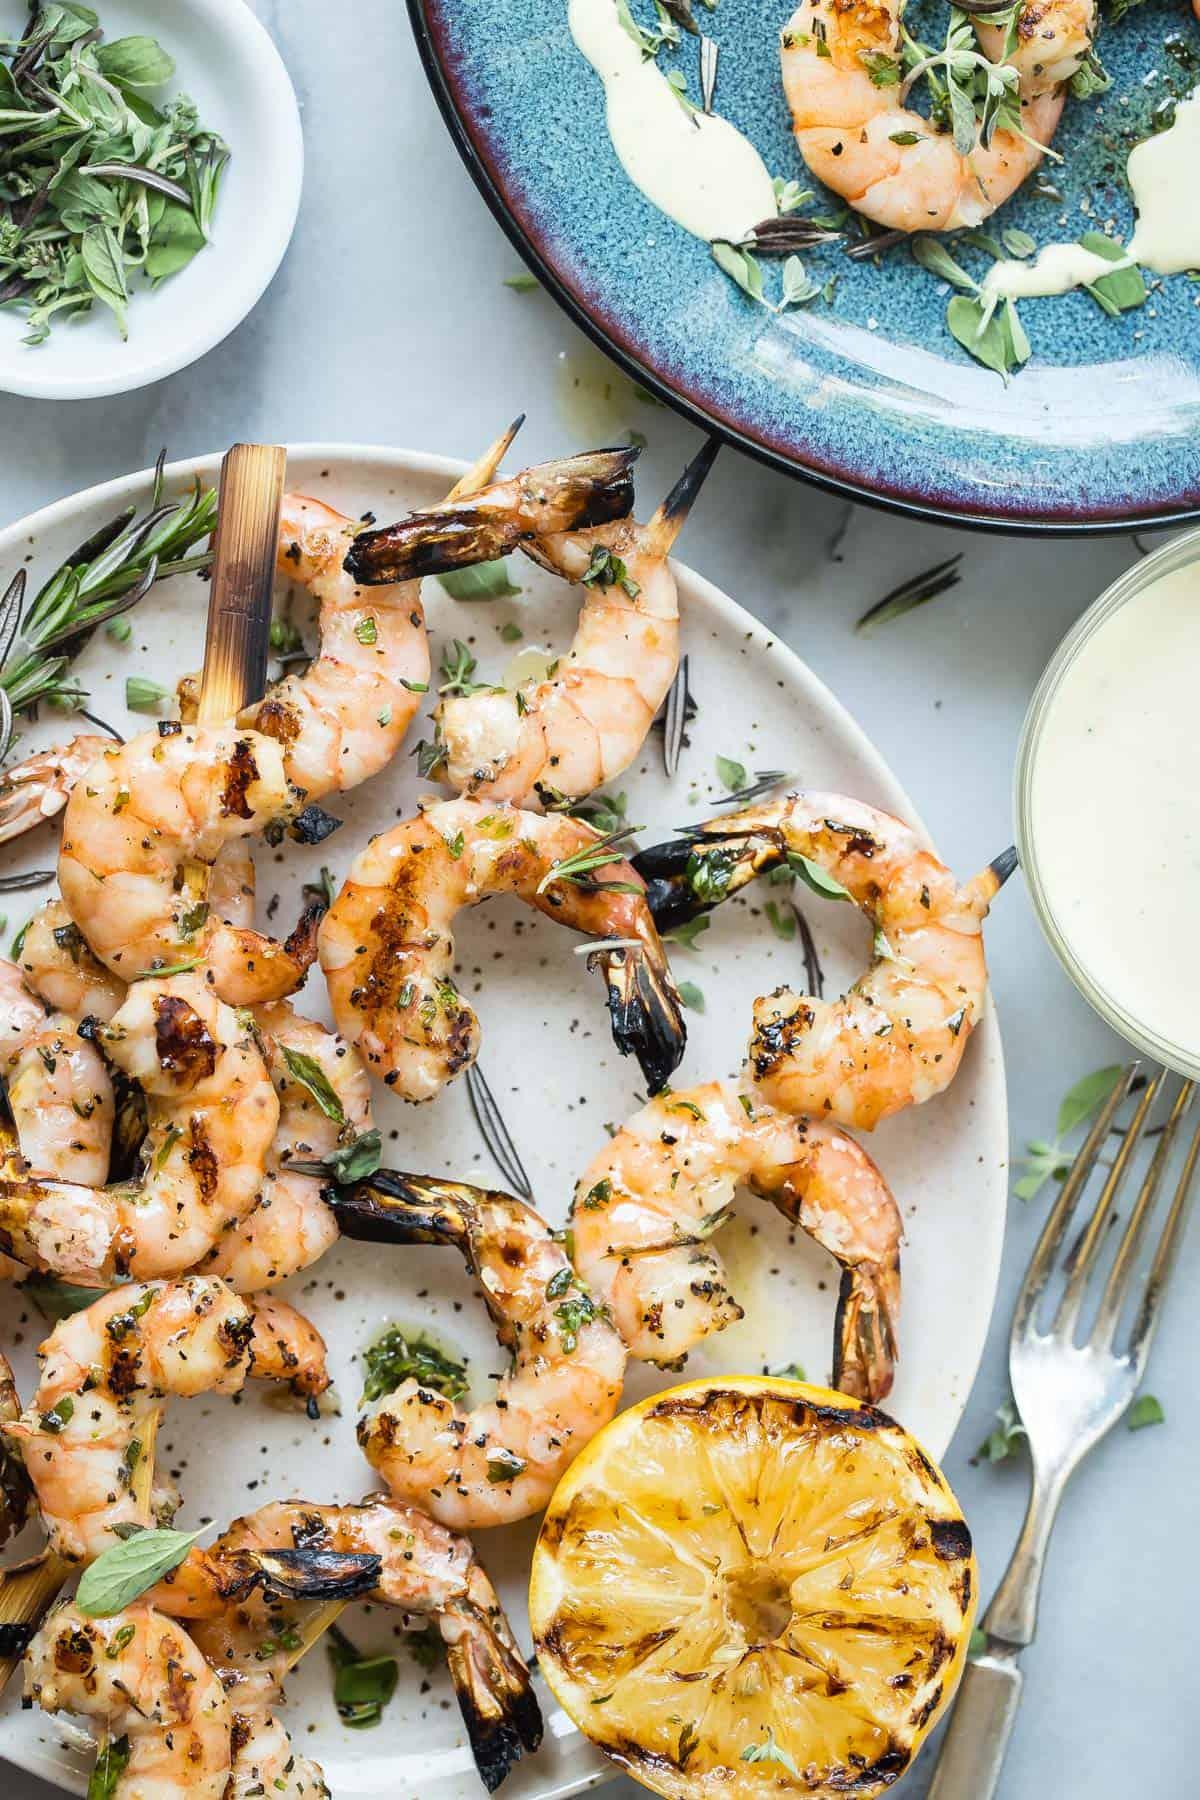 Grilled Shrimp Skewers with Lemon Aioli